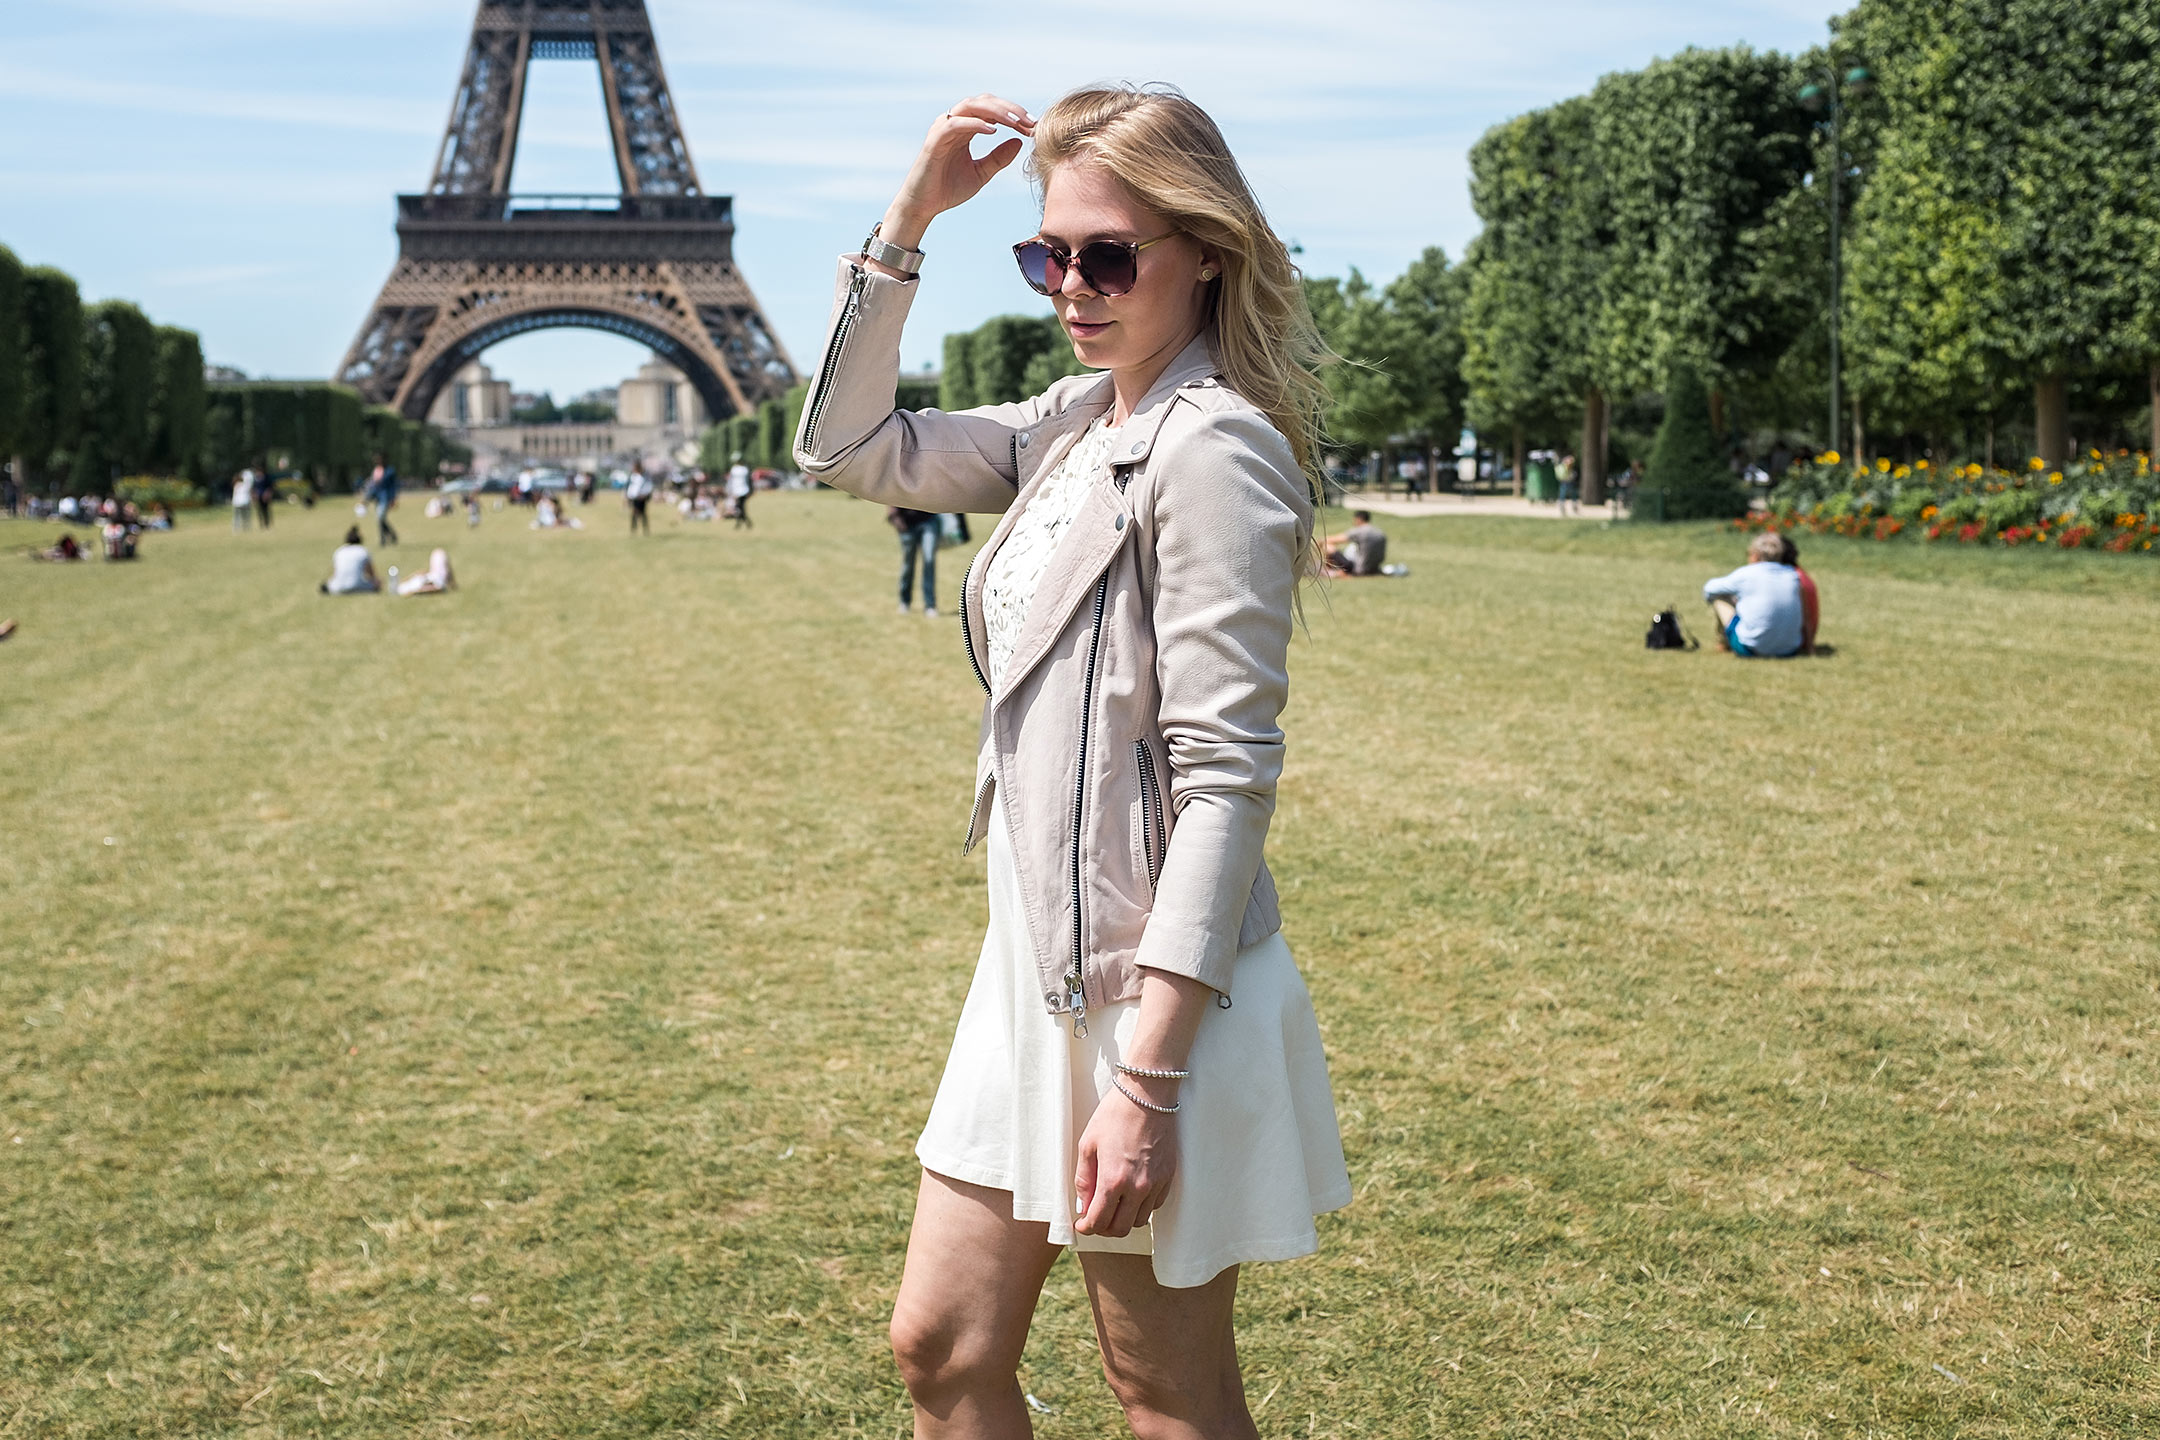 Rosa Lederjacke weißes SpitzenkleidOutfit Inspiration Sunnyinga